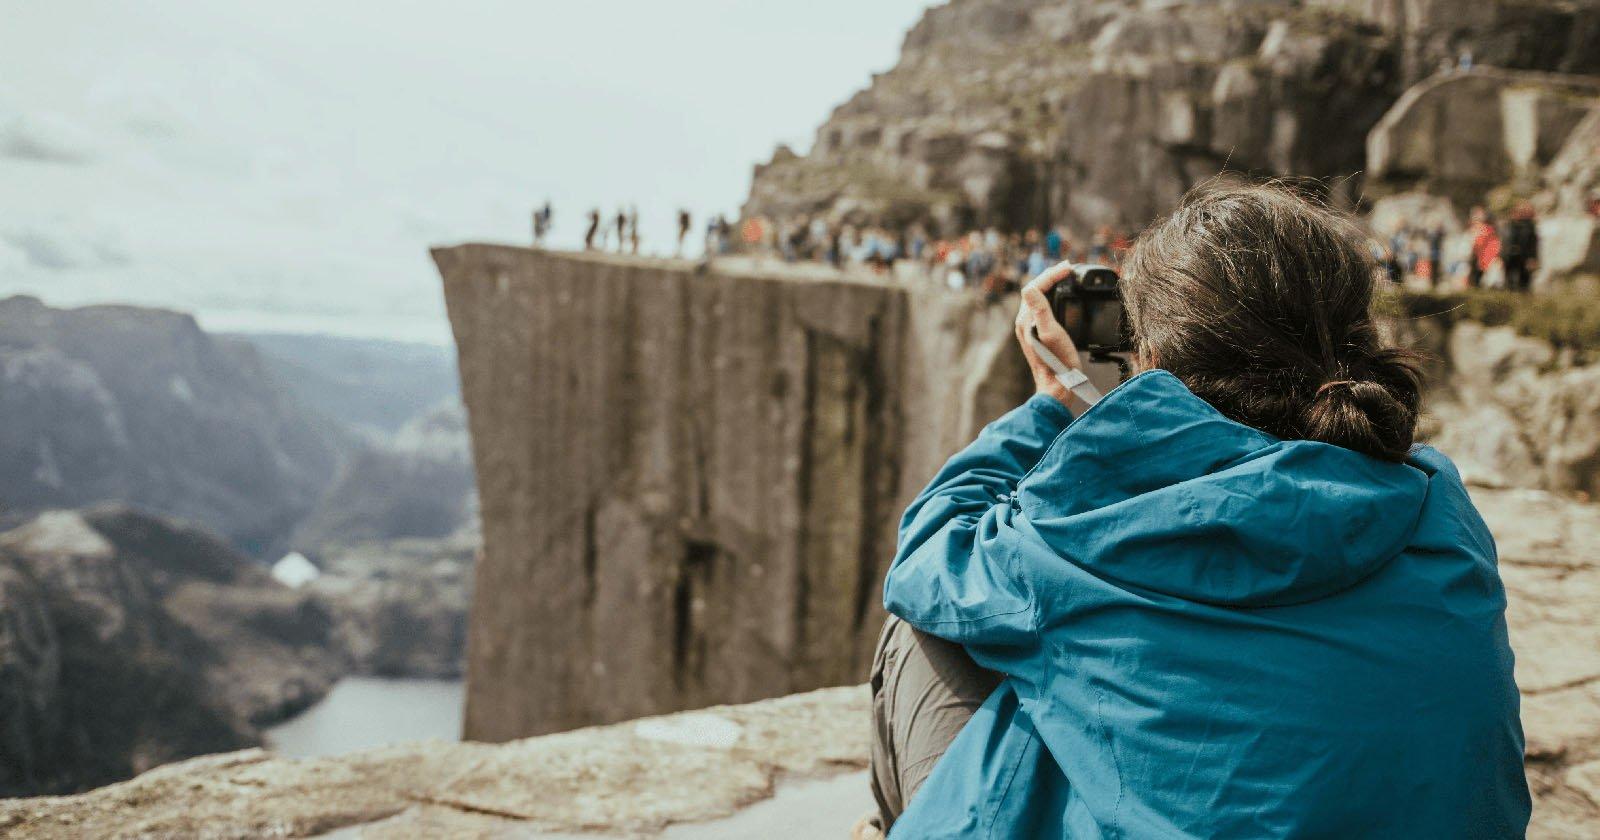 The C-List Landscape Photographer's Guide to Financial Success